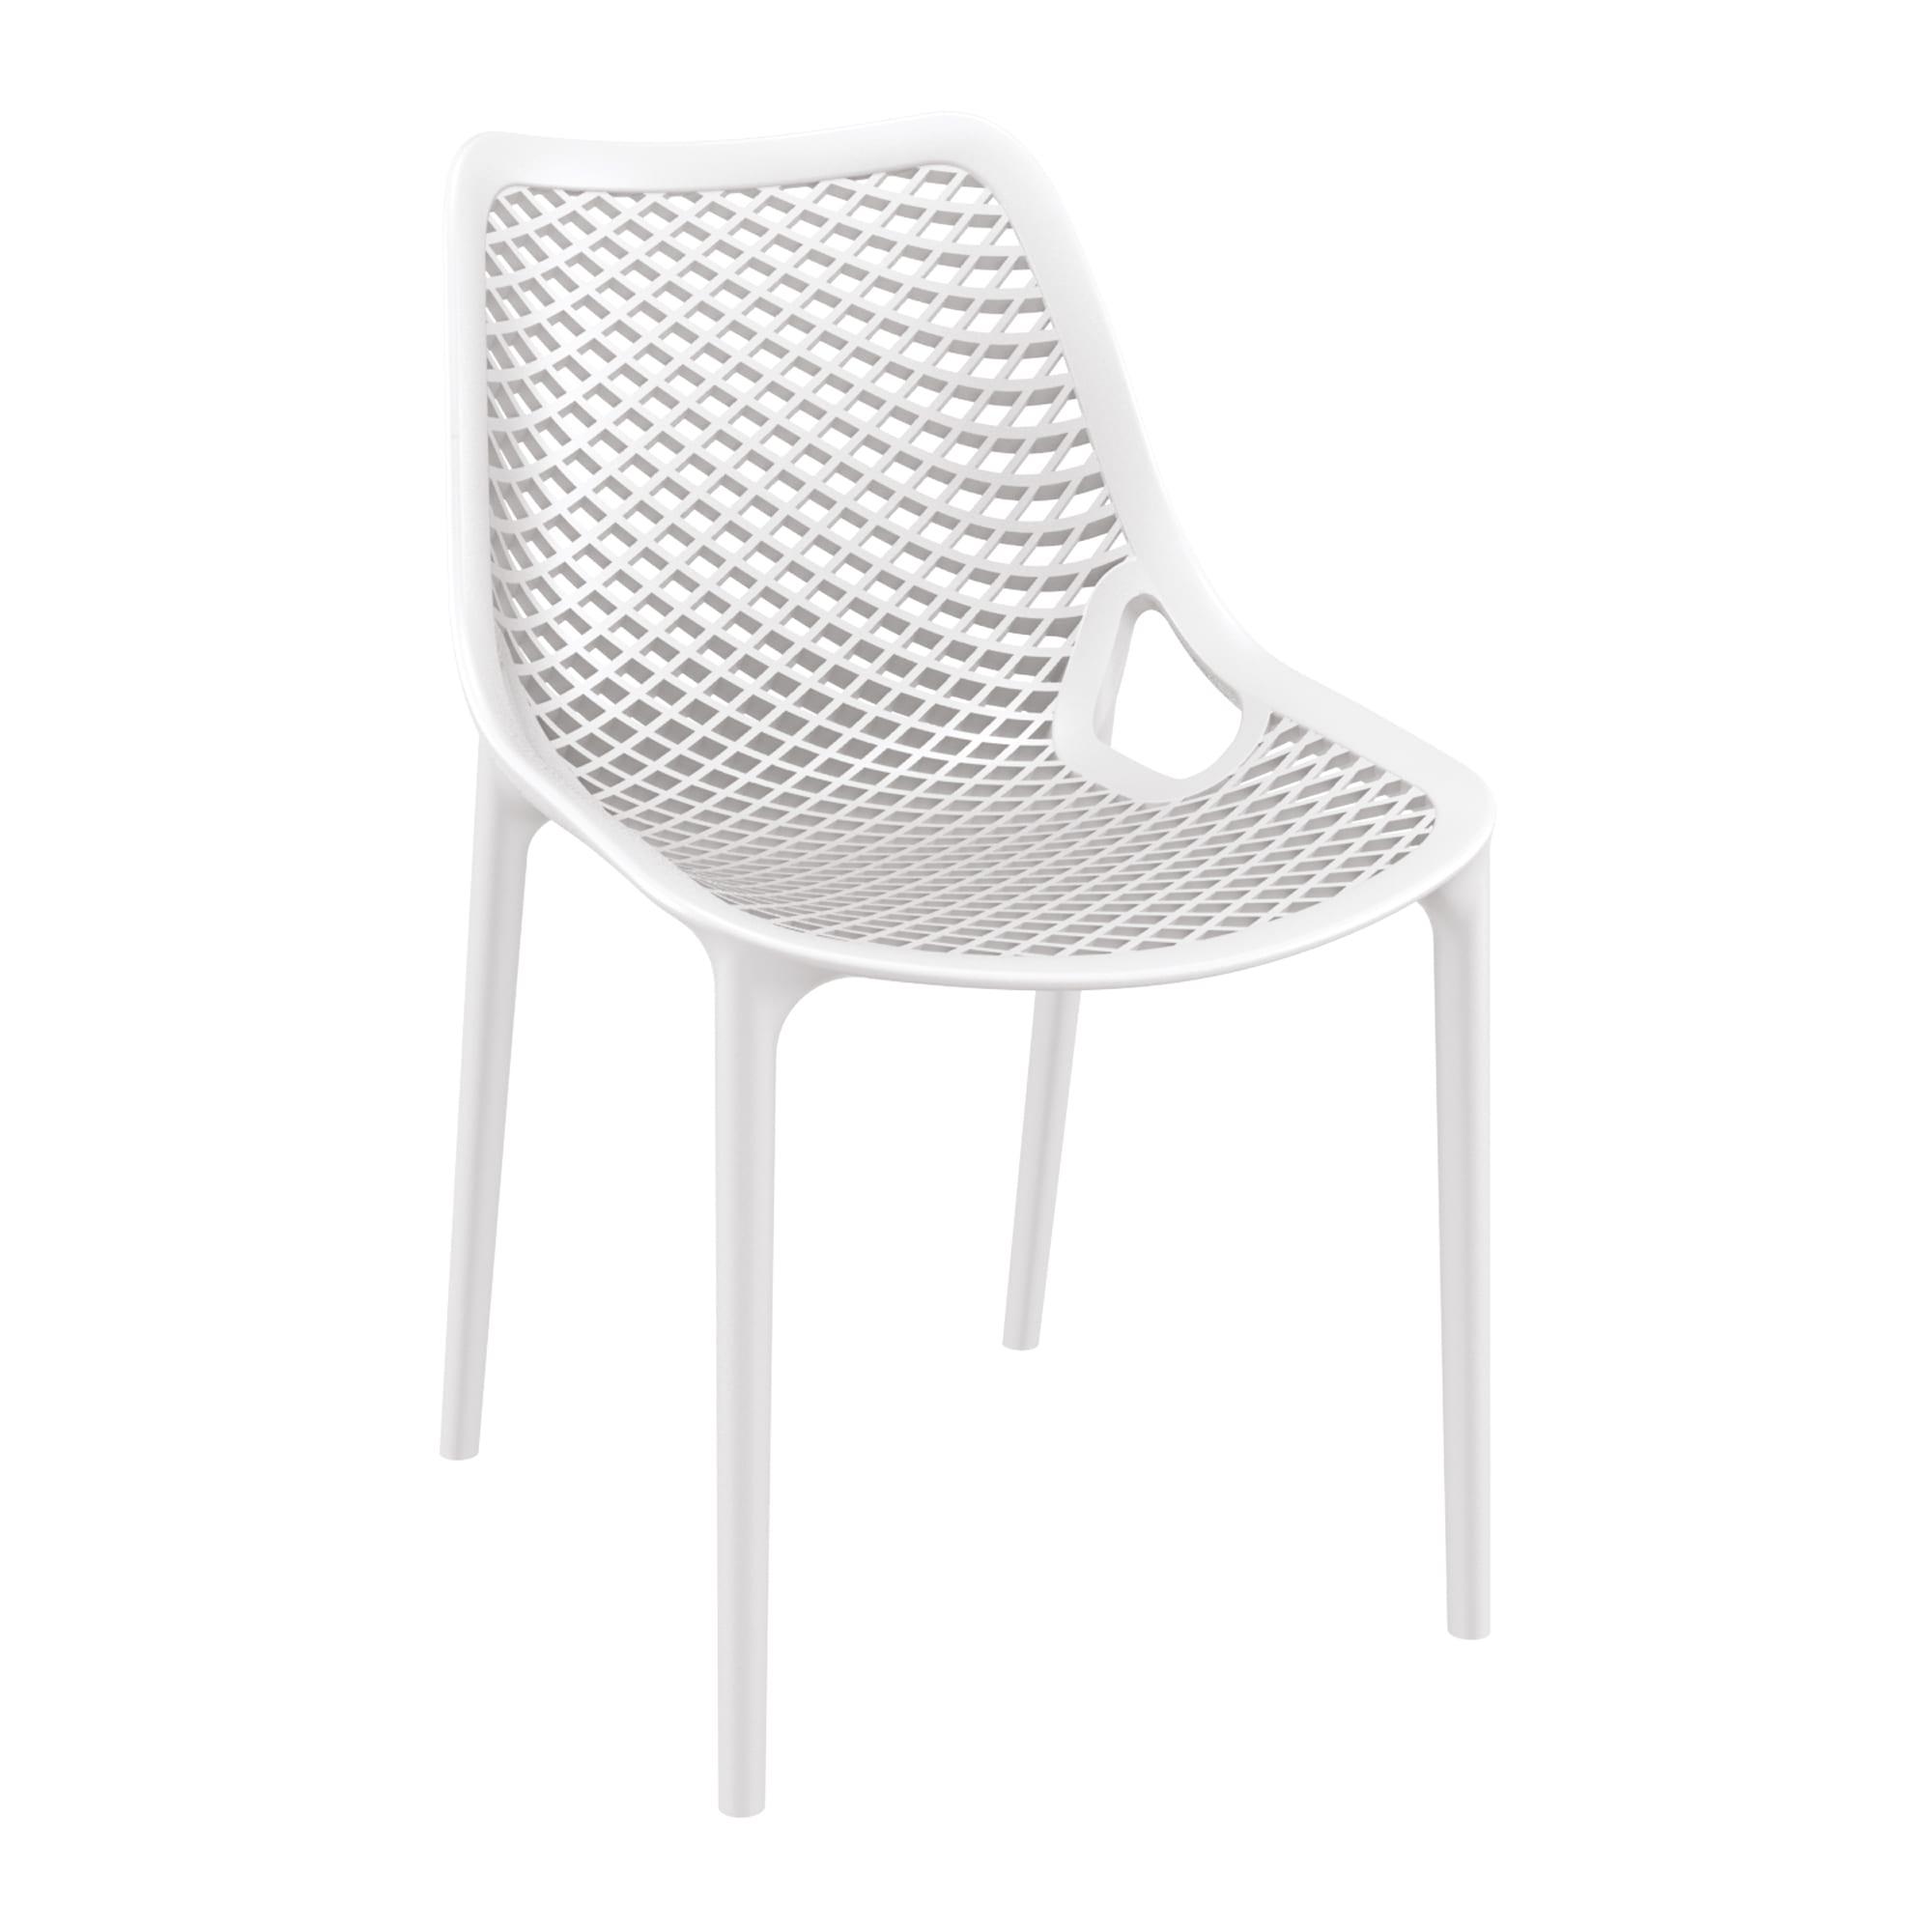 Spyro Side Chair - White